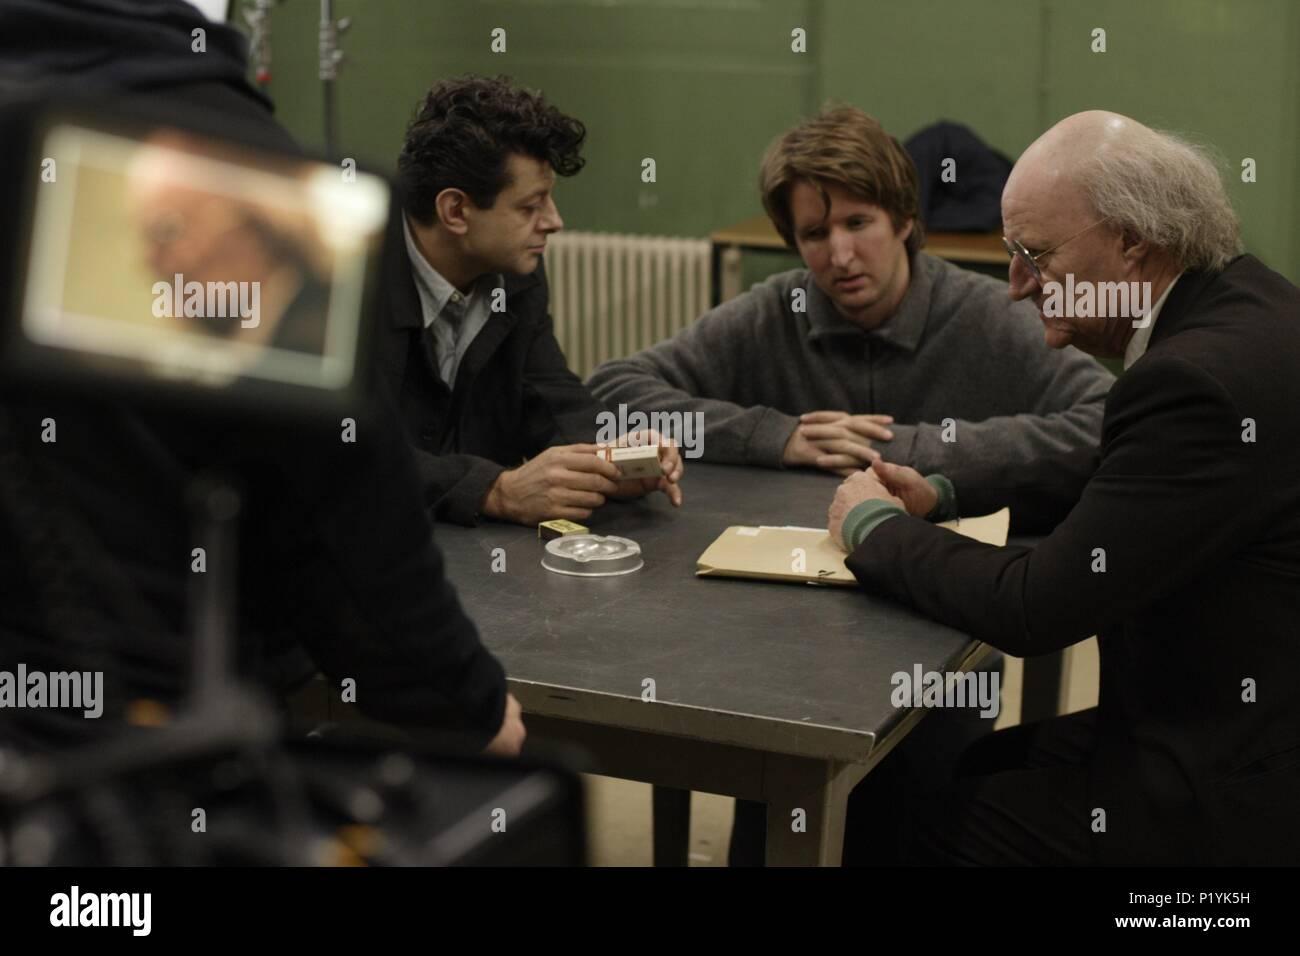 Original Film Title: LONGFORD.  English Title: LONGFORD.  Film Director: TOM HOOPER.  Year: 2006.  Stars: JIM BROADBENT; ANDY SERKIS. Credit: HBO FILMS / Album - Stock Image